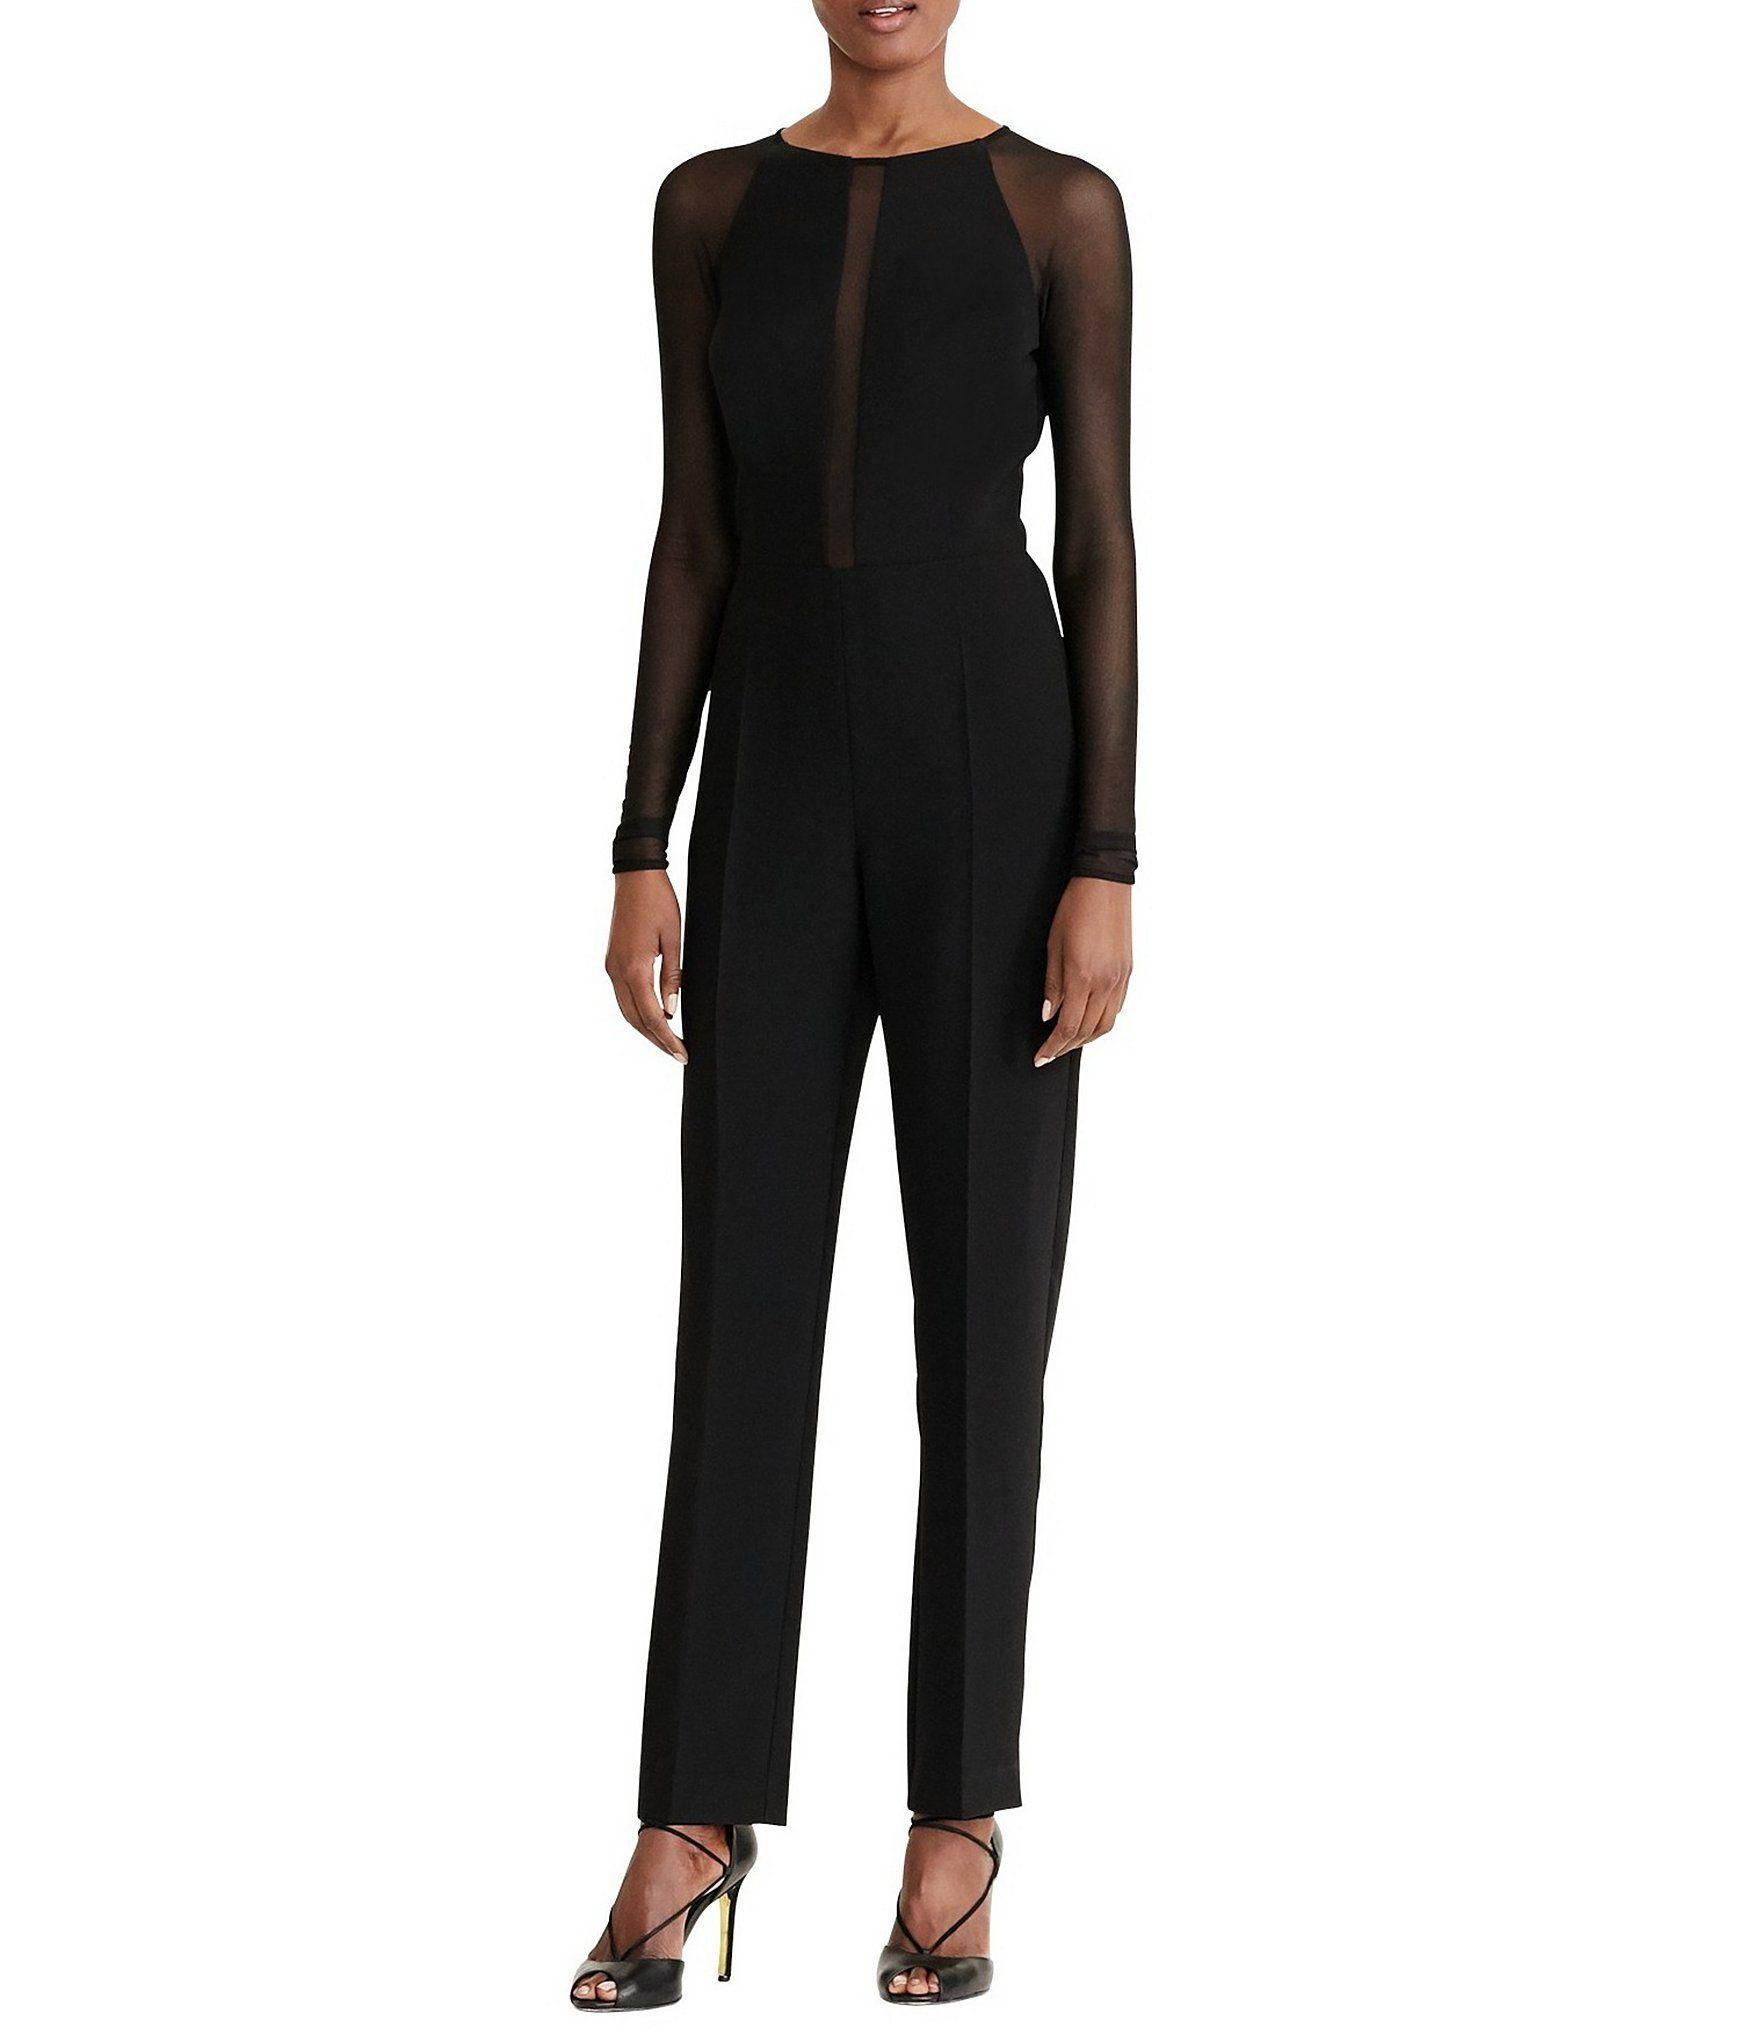 6e1bbadab19 Lauren Ralph Lauren MeshPanel Jersey Jumpsuit  Dillards